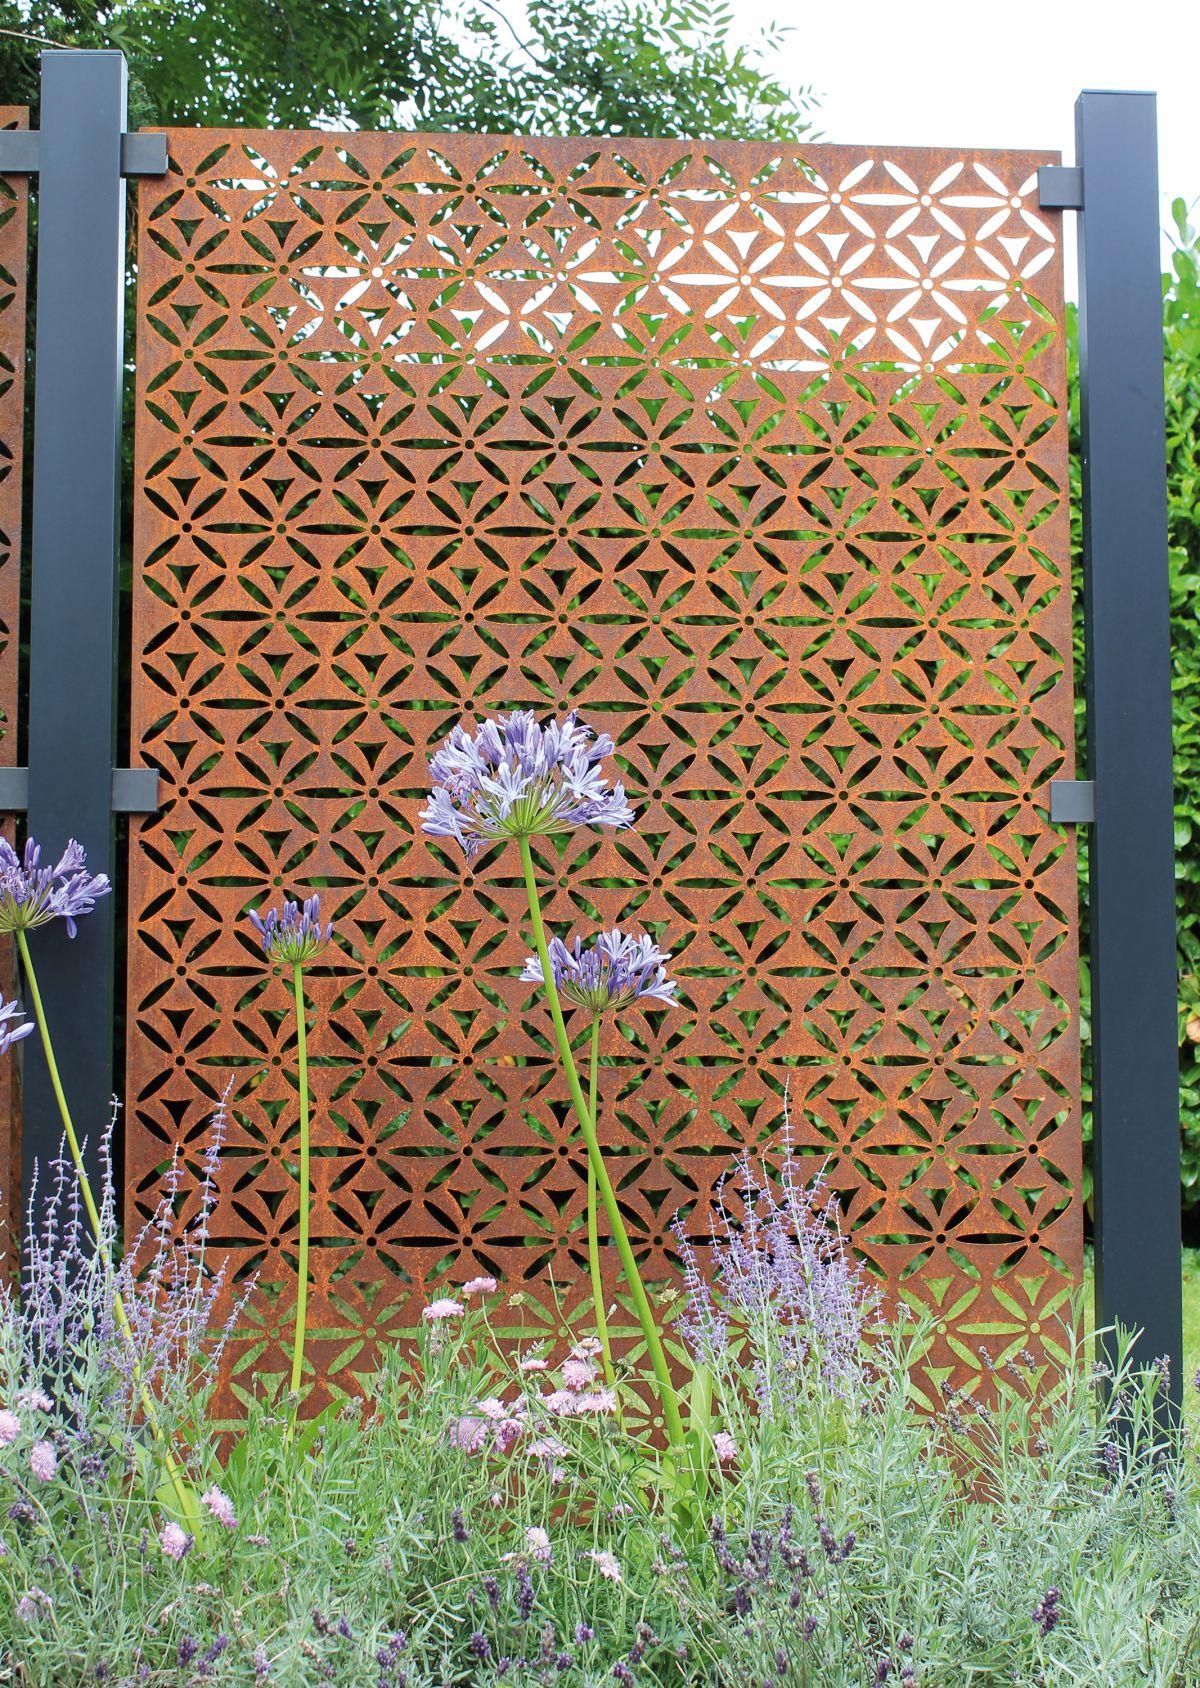 Garden Fence Ideas 15 Stylish Designs